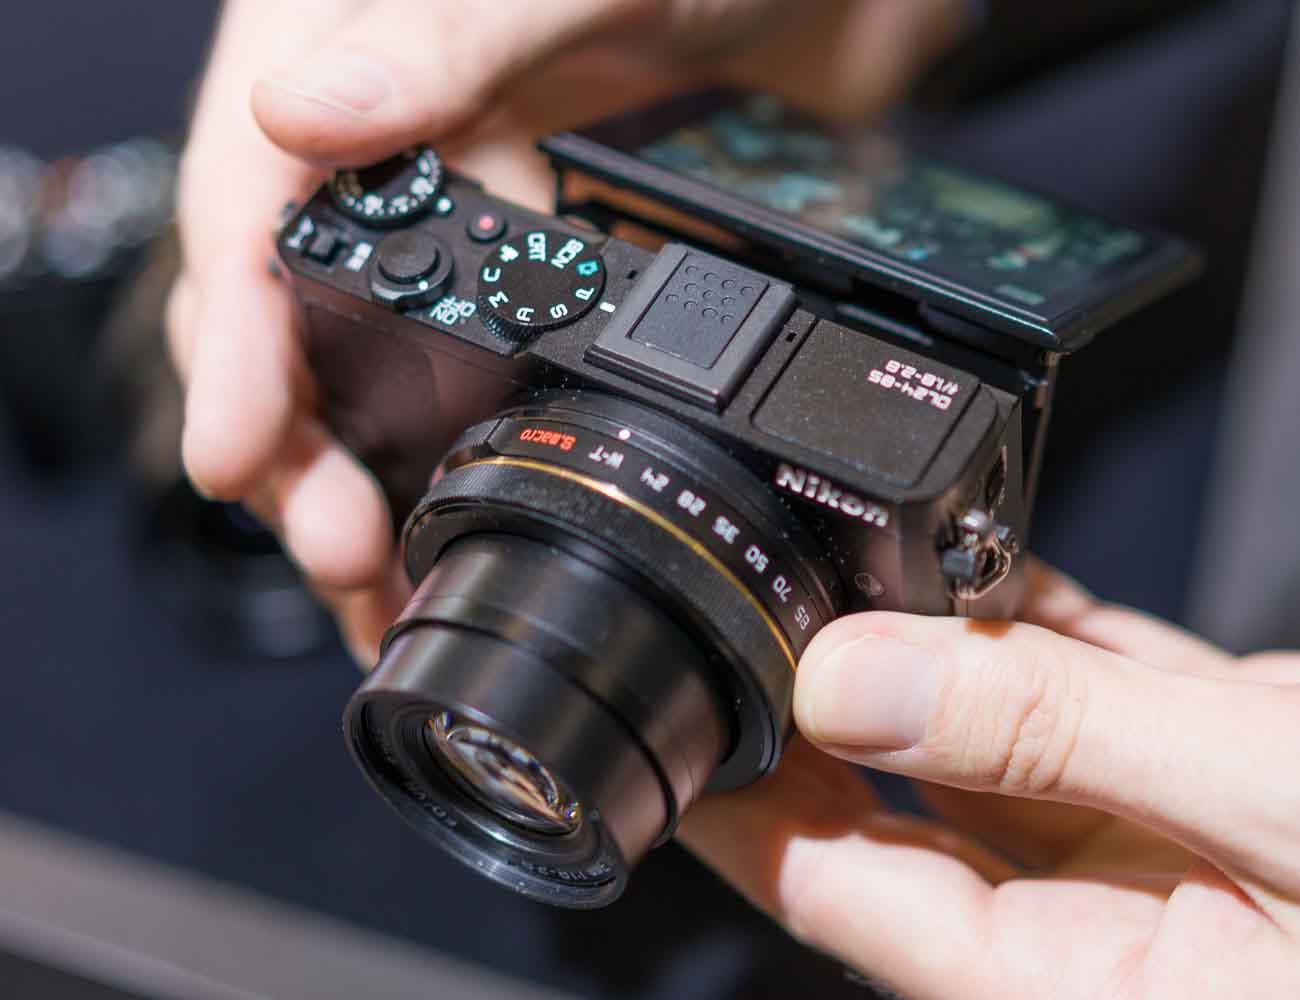 Nikon+DL+Compact+Camera+Series